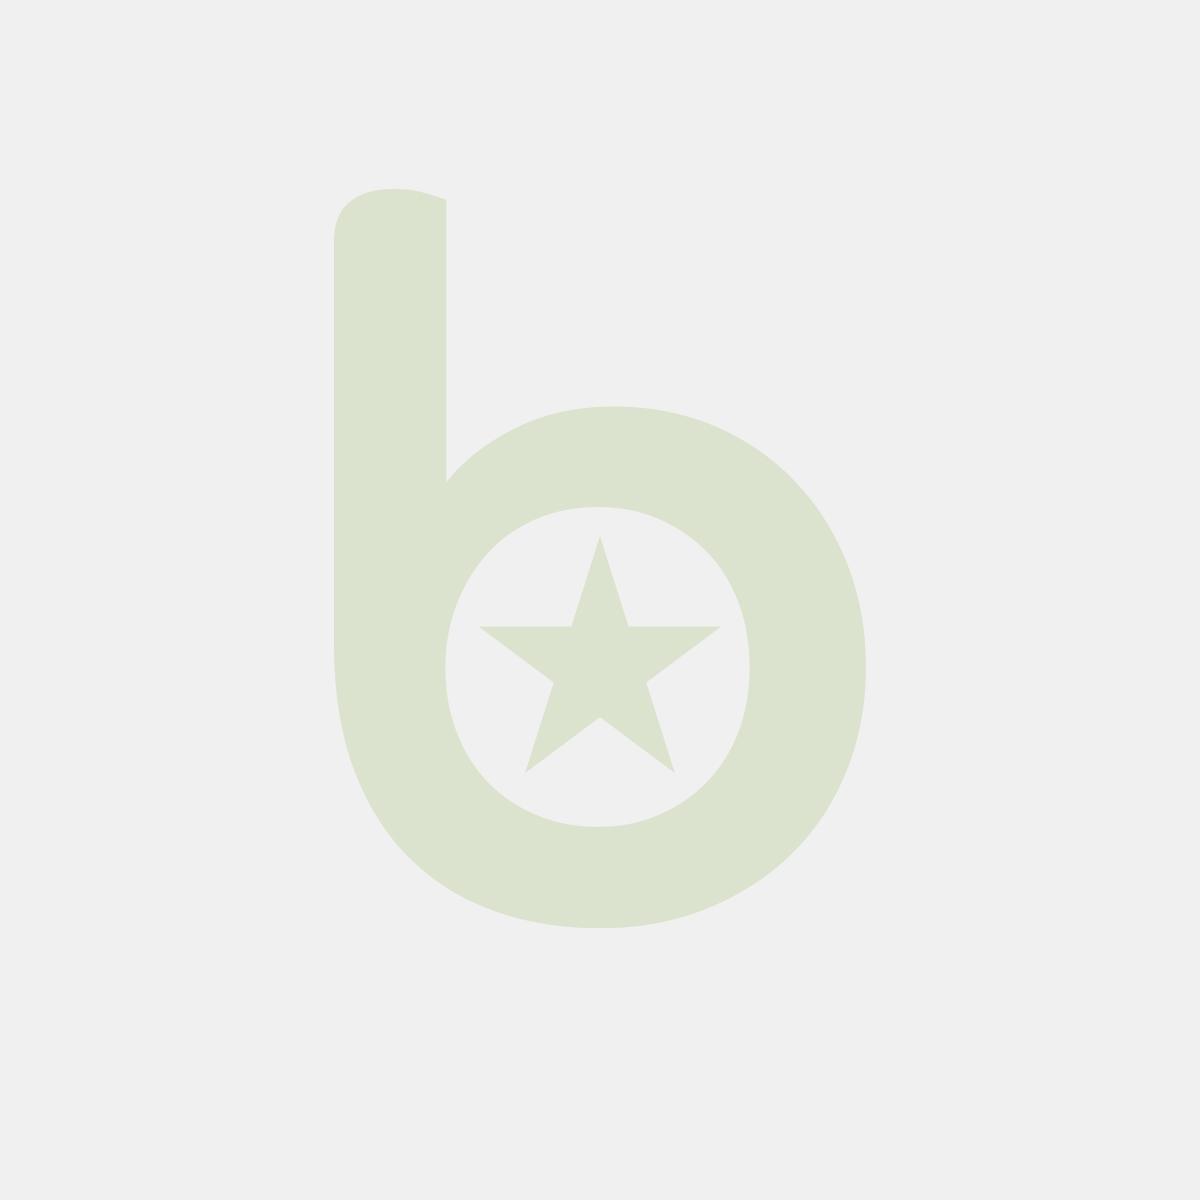 FINGERFOOD - pucharek PS 70ml czarny 4,9xh.7,7cm op. 25 sztuk